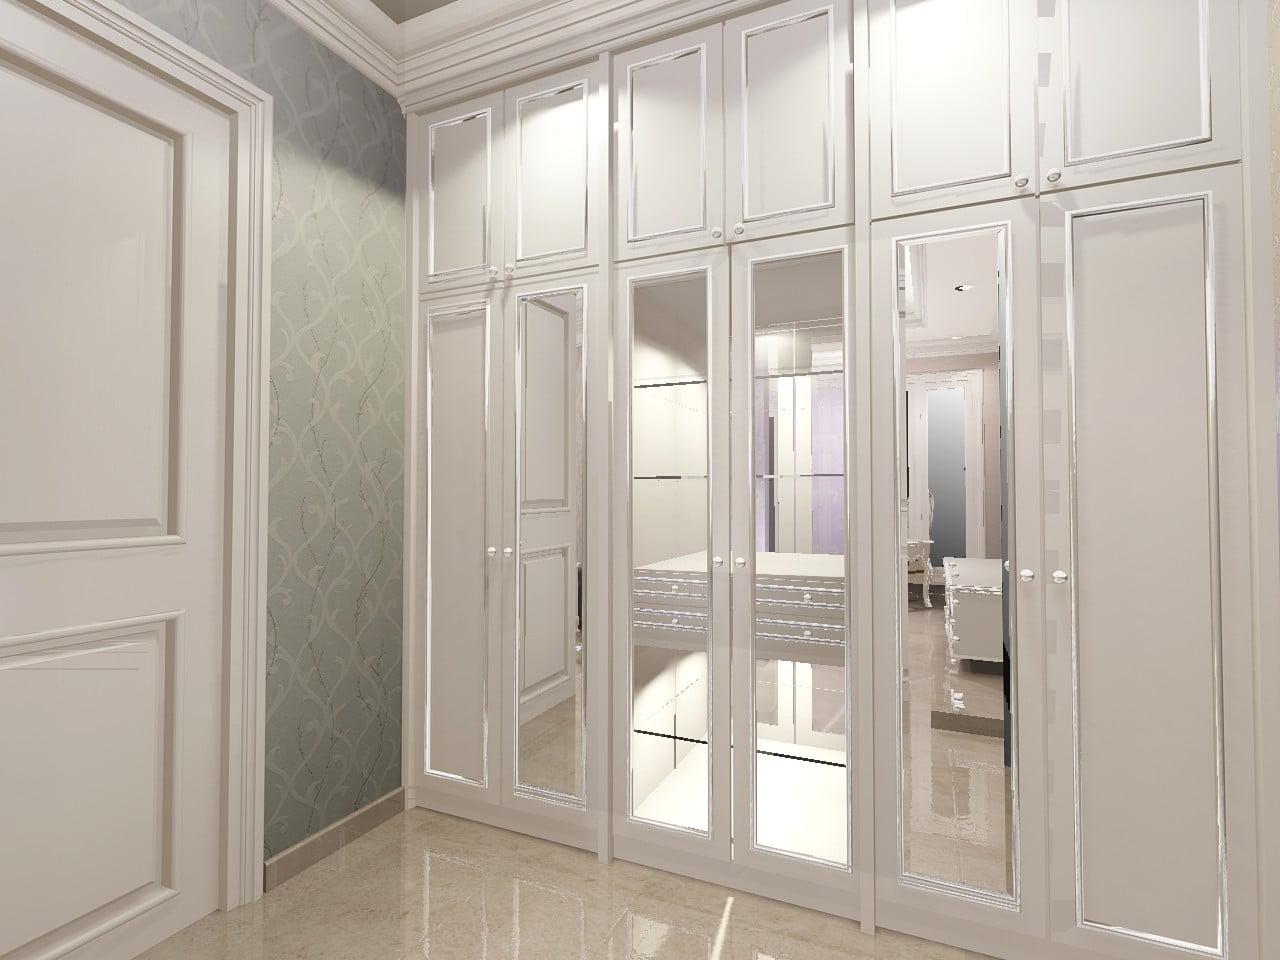 interior design furniture images. Halim-interior_american_rt6_rt-a-pr-v-w-alpak-rdr Interior Design Furniture Images